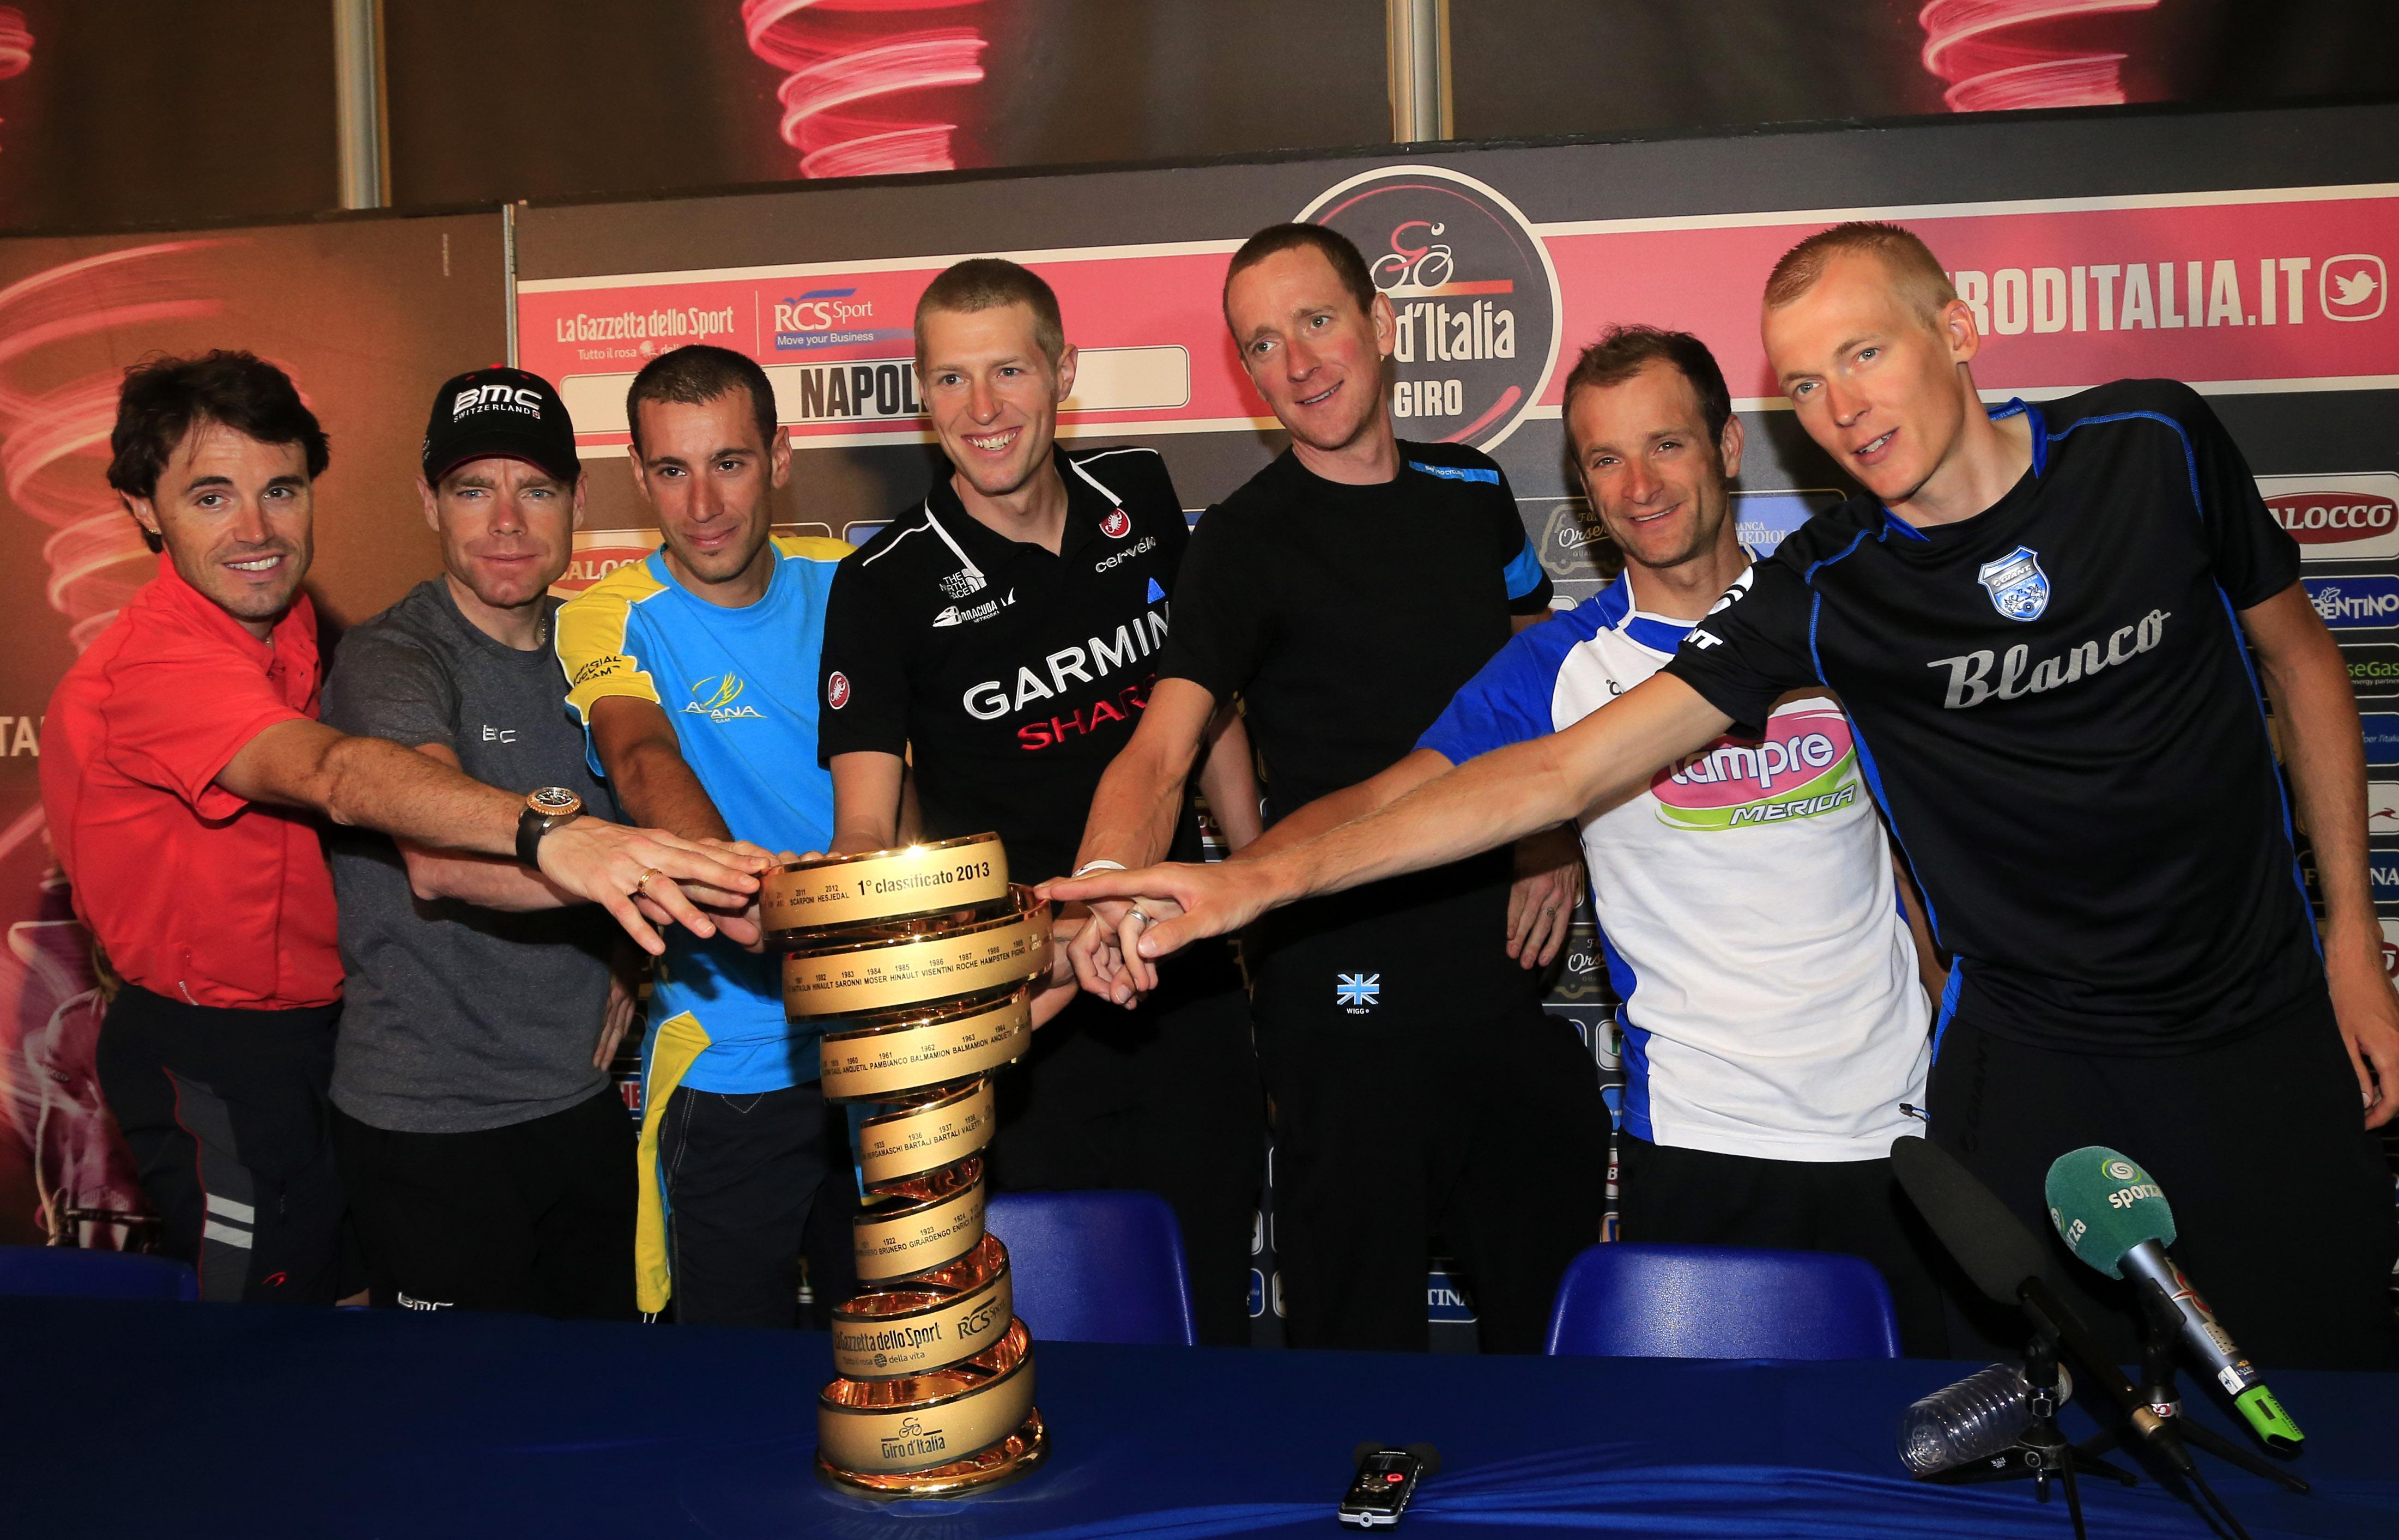 Bradley Wiggins made an unsuccessful bid for the Giro in 2013